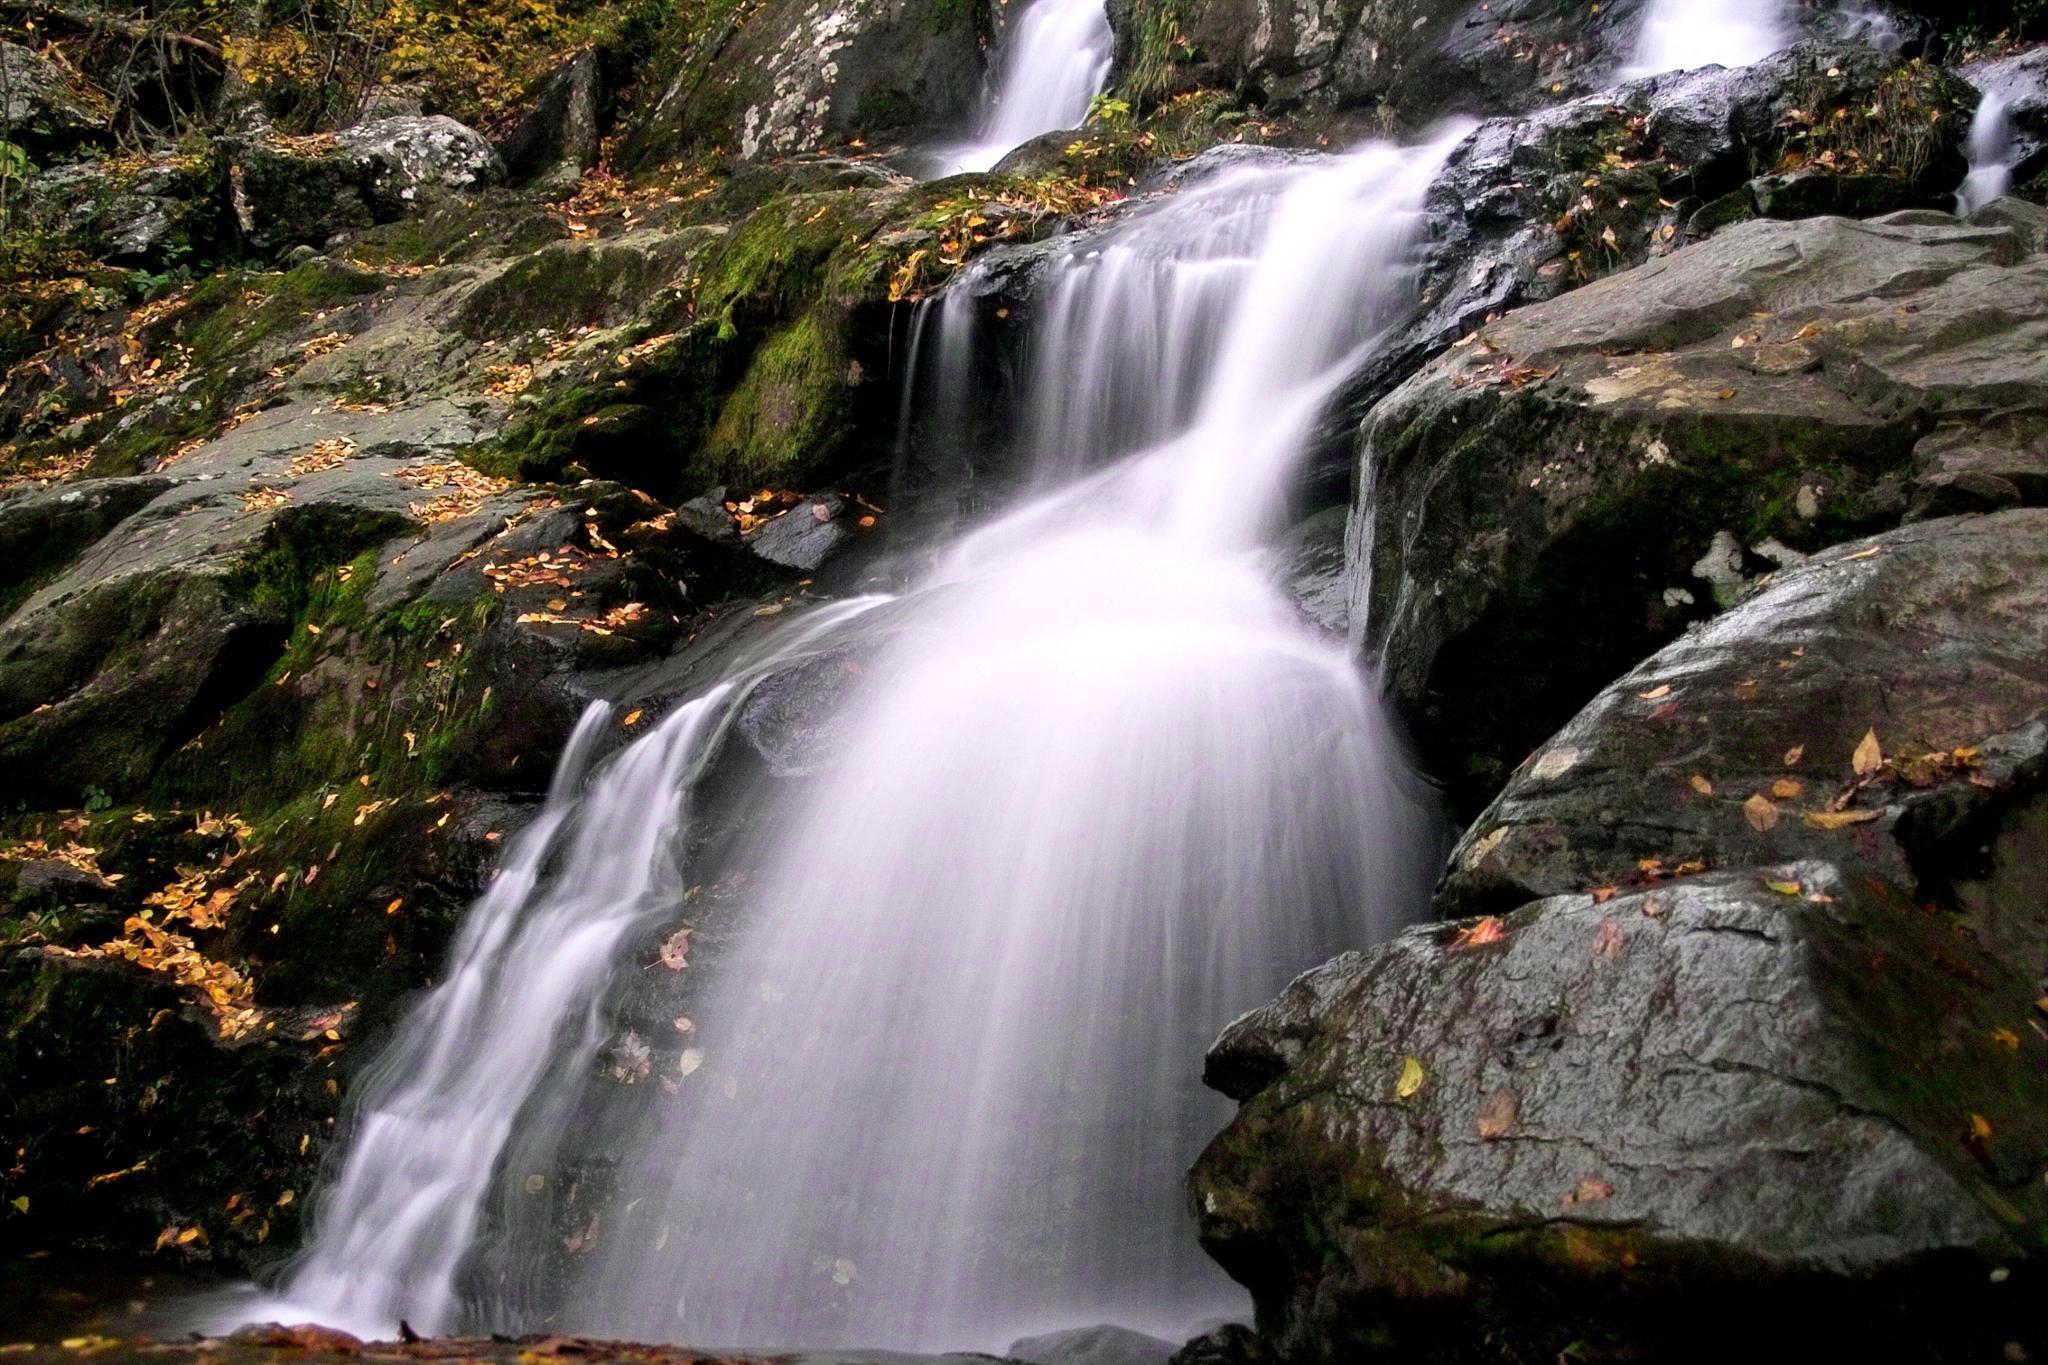 Waterfall by munacra